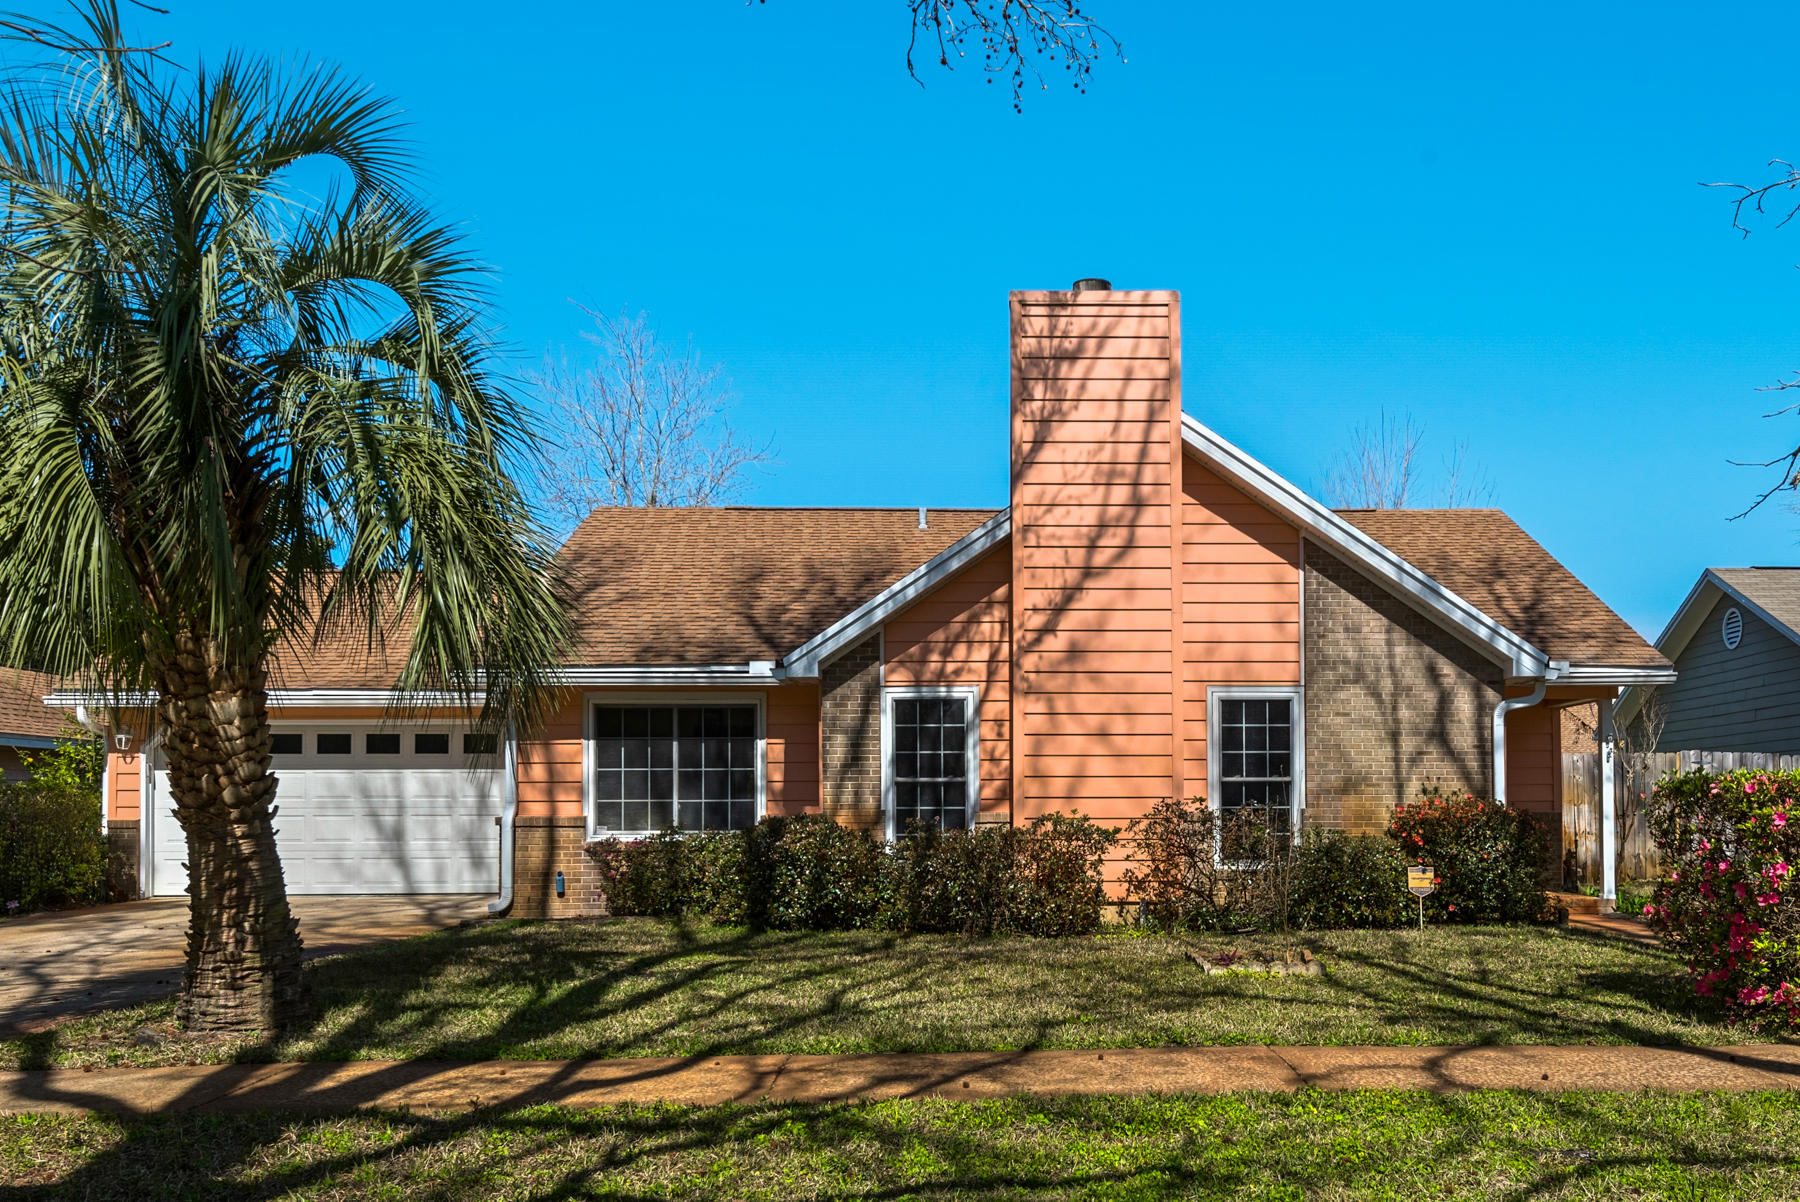 Photo of home for sale at 539 Sibert, Destin FL